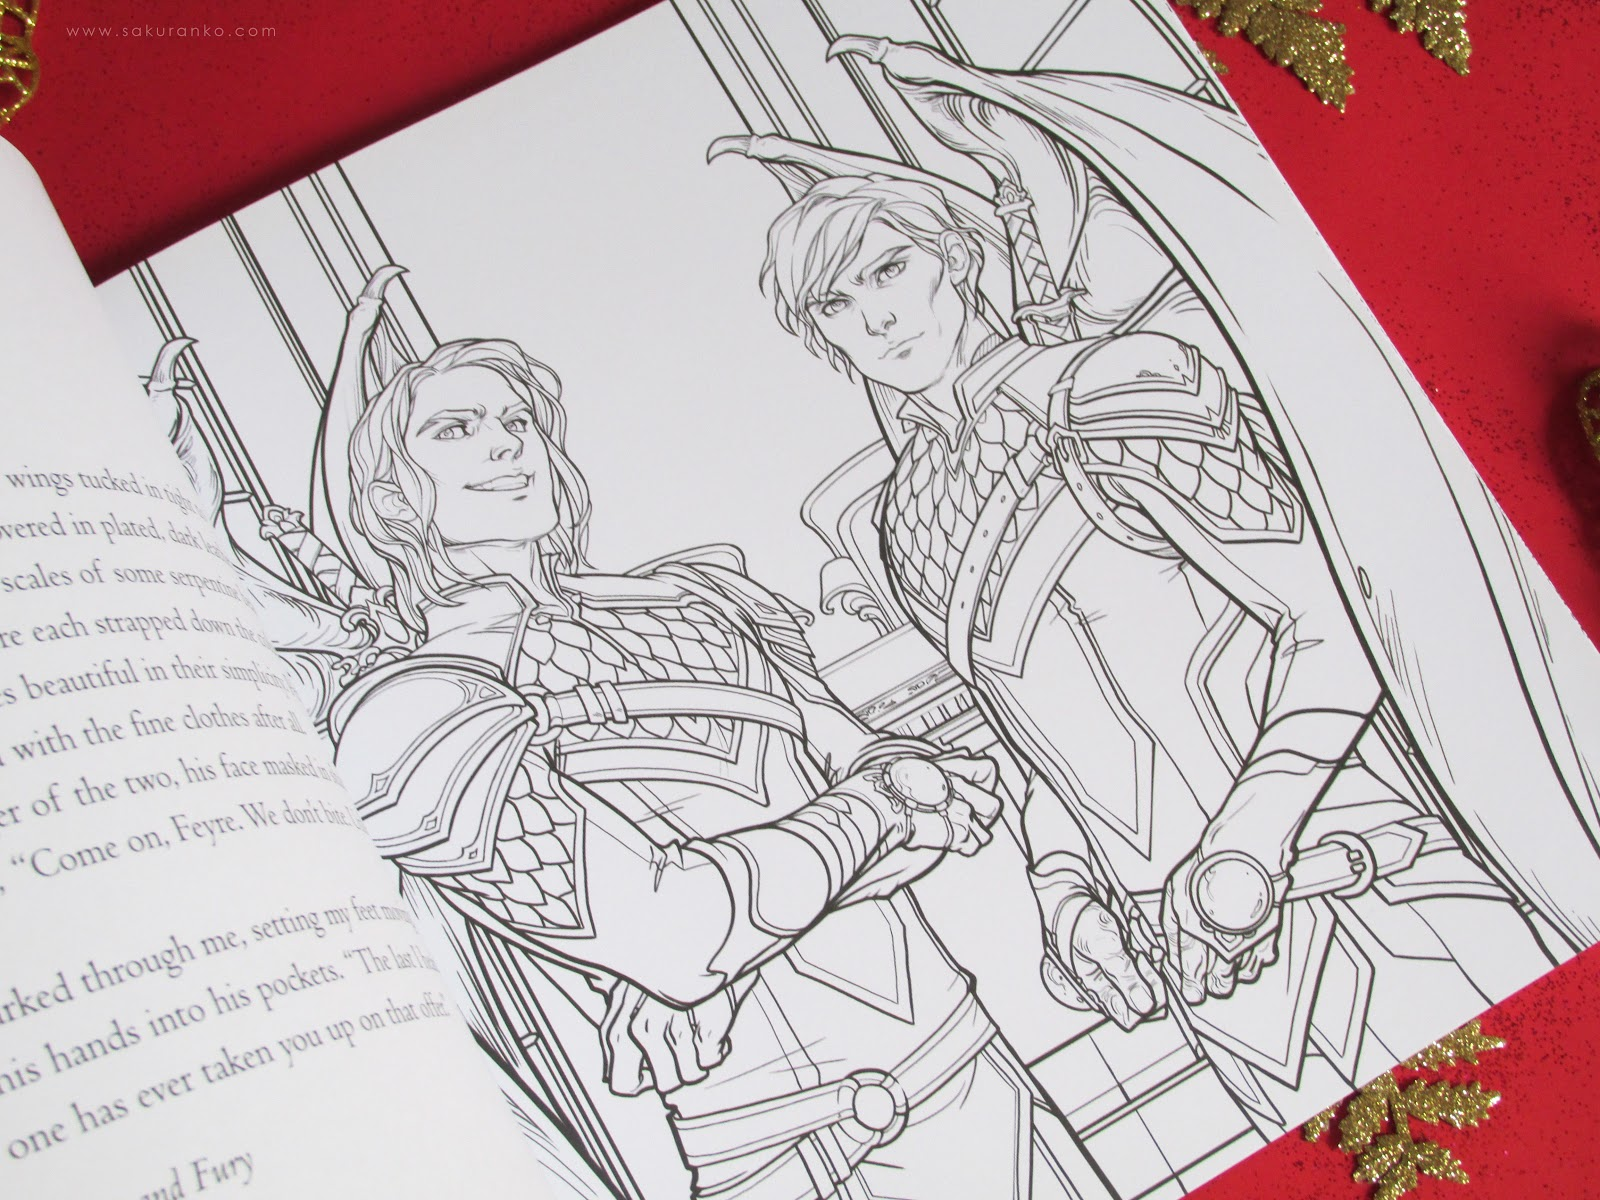 Sakuranko A Court Of Thorns And Roses Coloring Book By Sarah J Maas